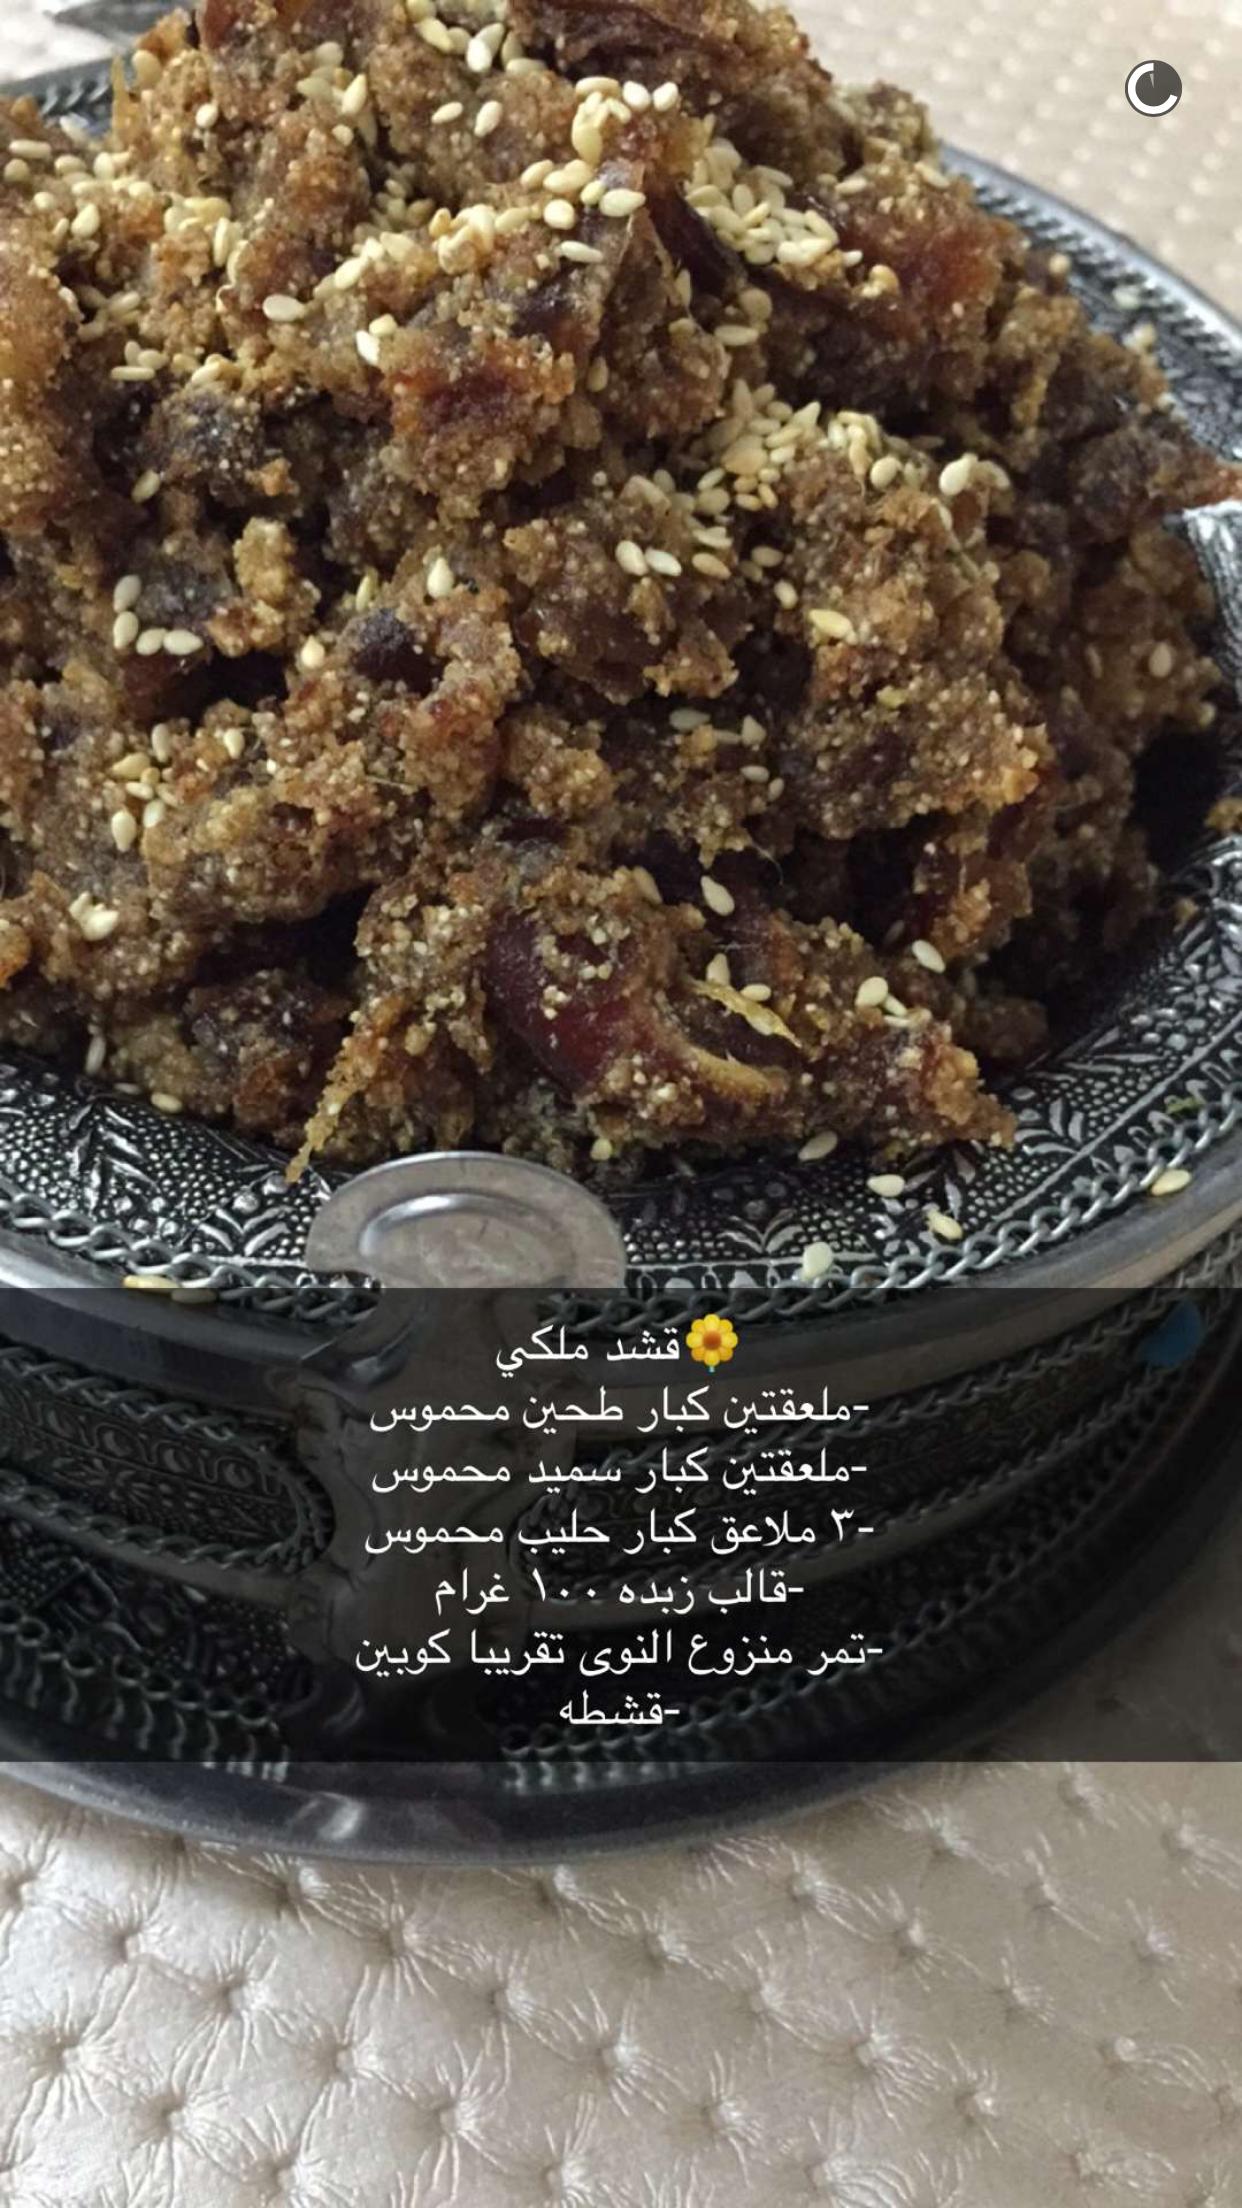 Pin By Muna Dubai On طبخ Save Food Sweets Recipes Food Receipes